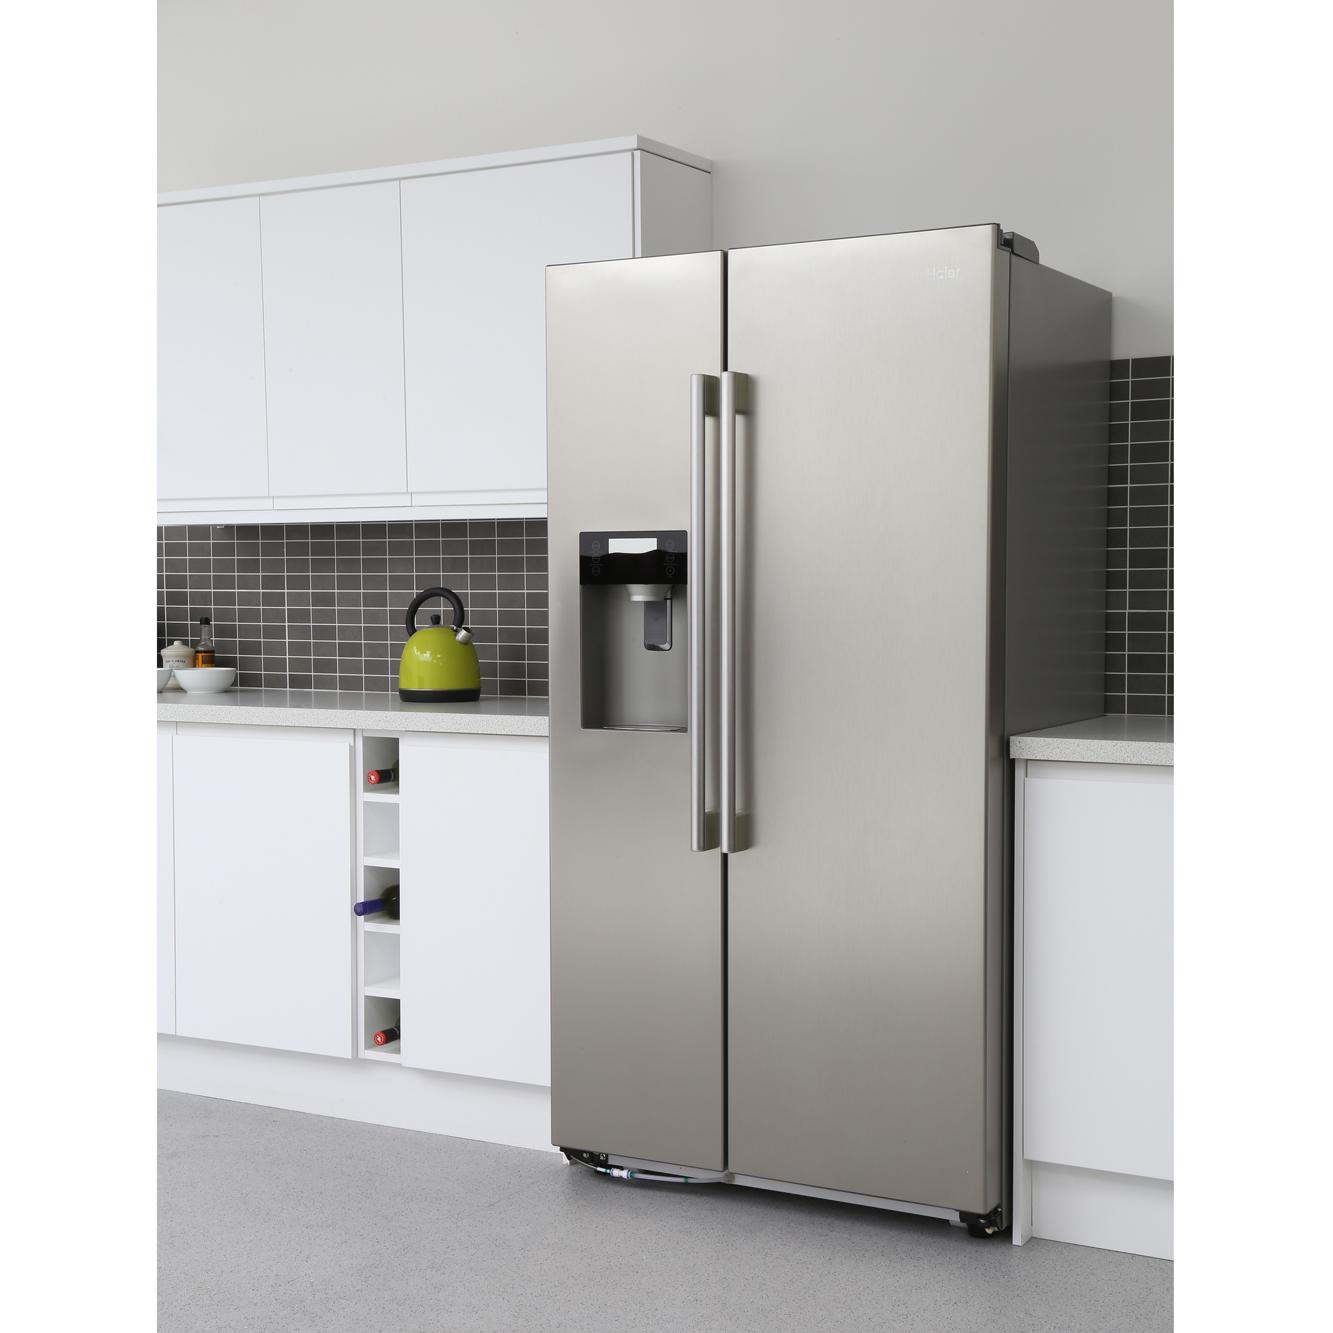 haier hrf 628if6 american fridge freezer stainless steel effect buy online today 365. Black Bedroom Furniture Sets. Home Design Ideas